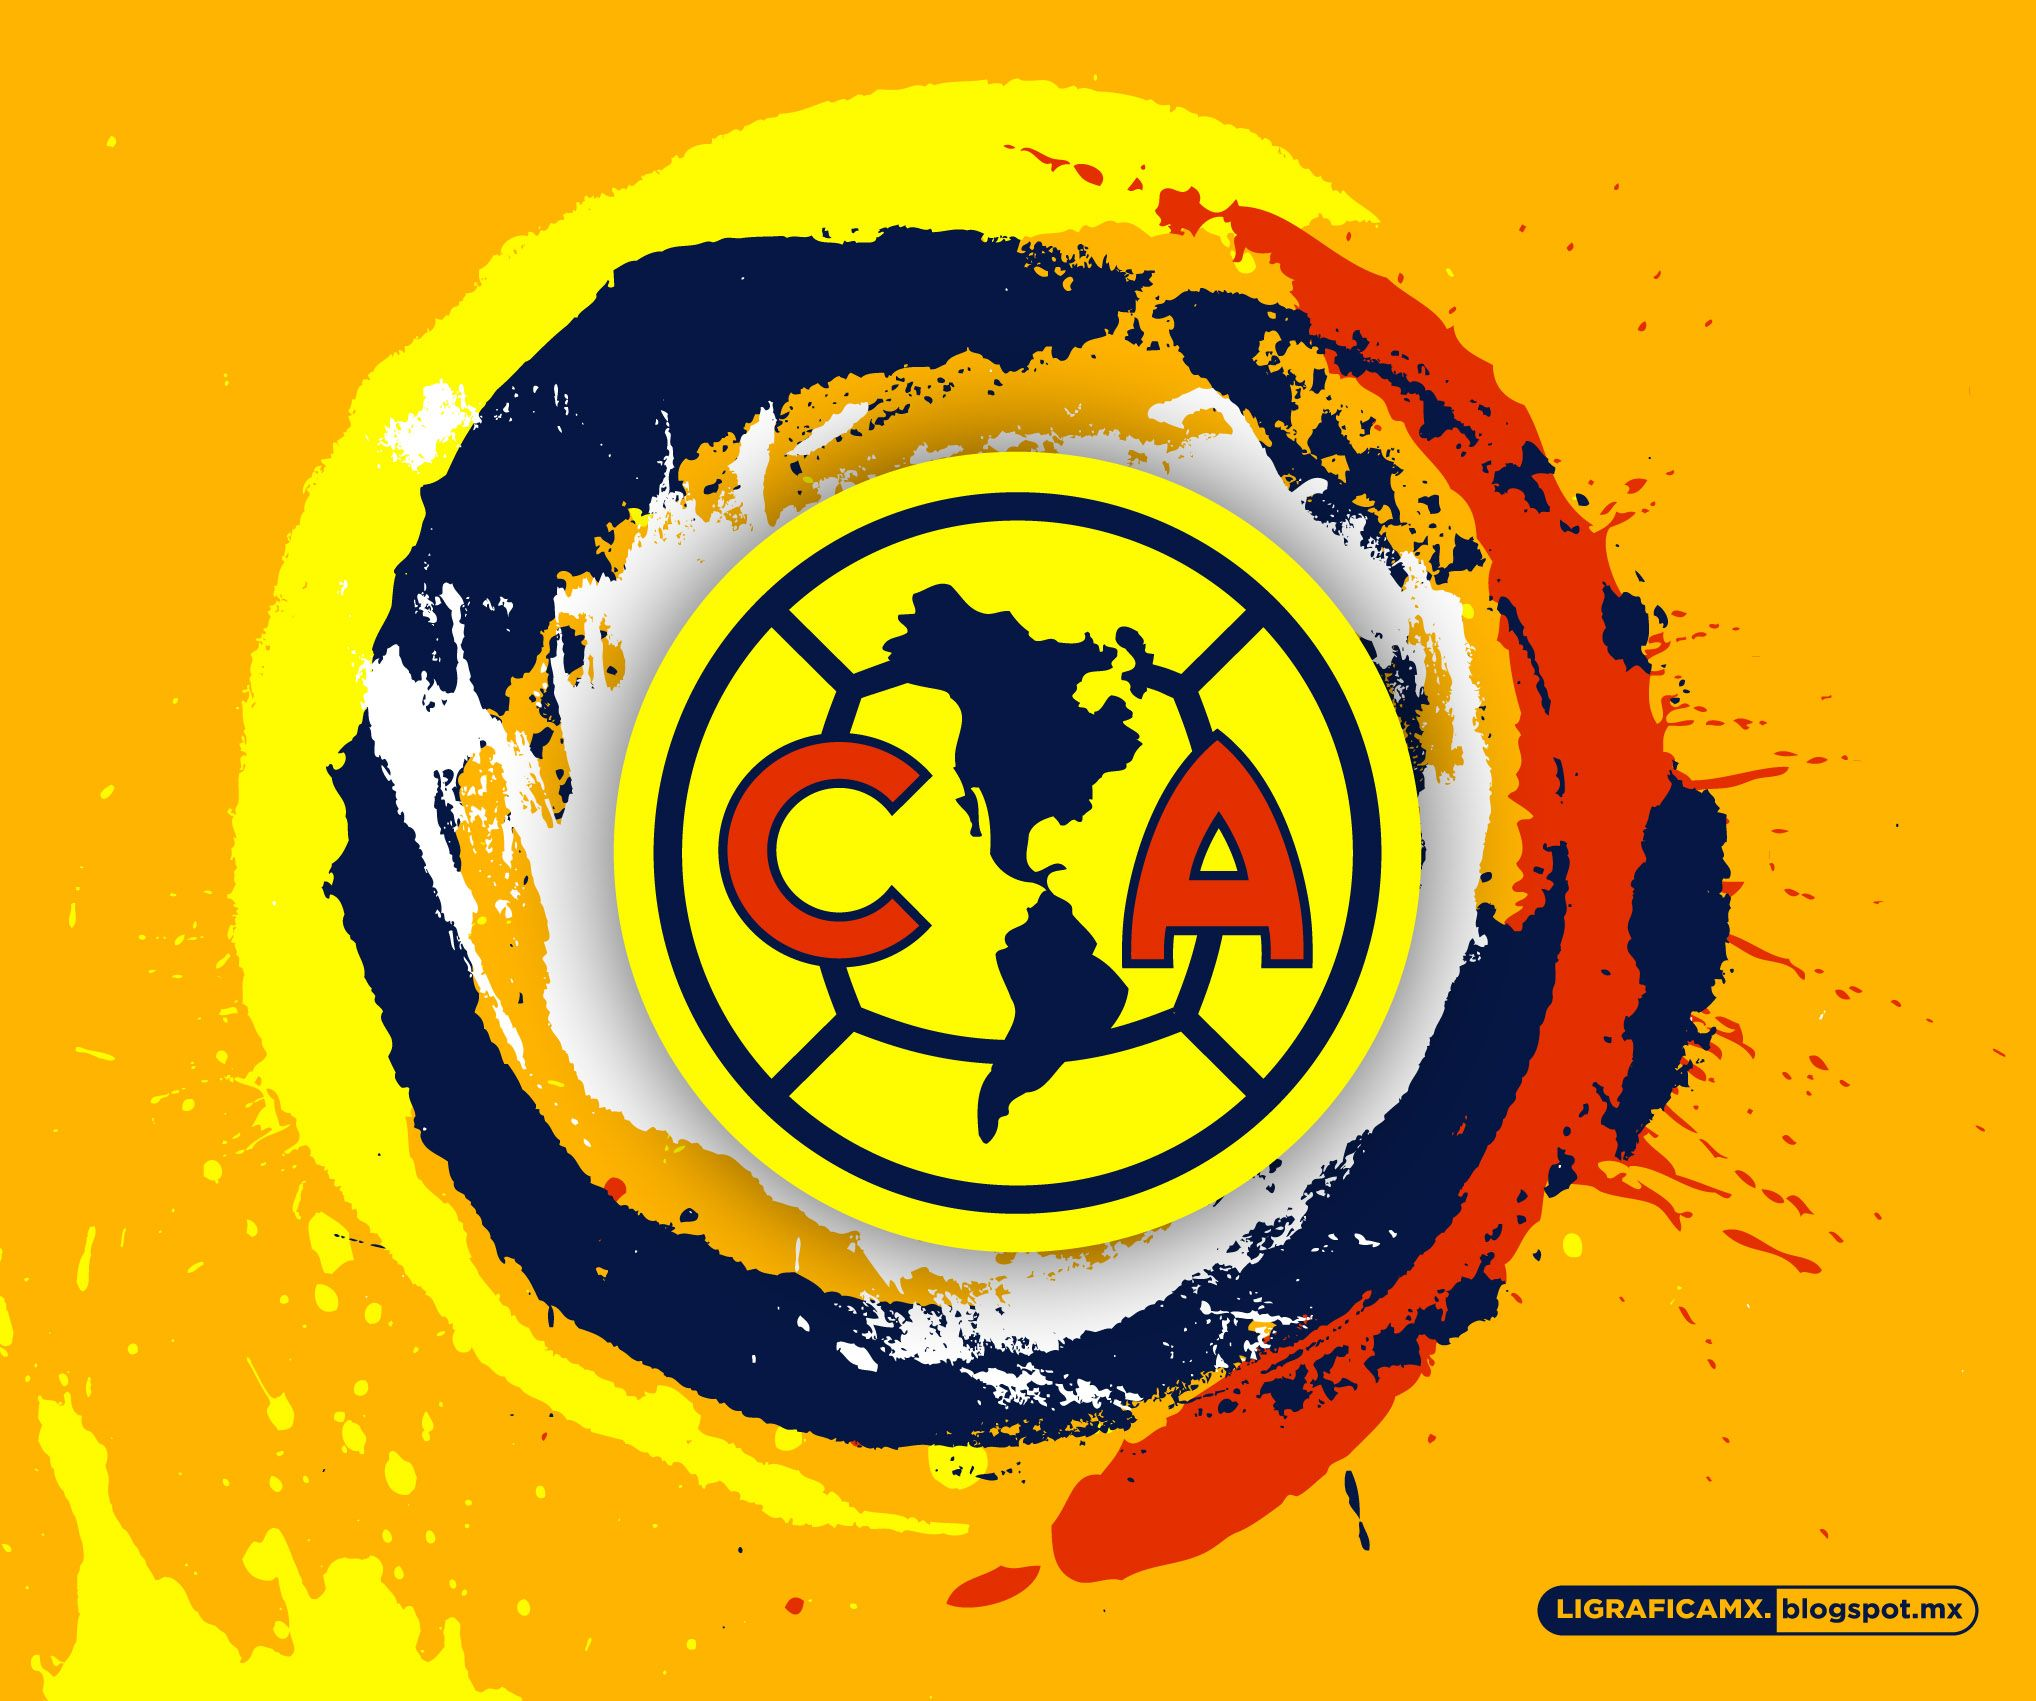 #Wallpaper #SplashCircle #América #LigraficaMX